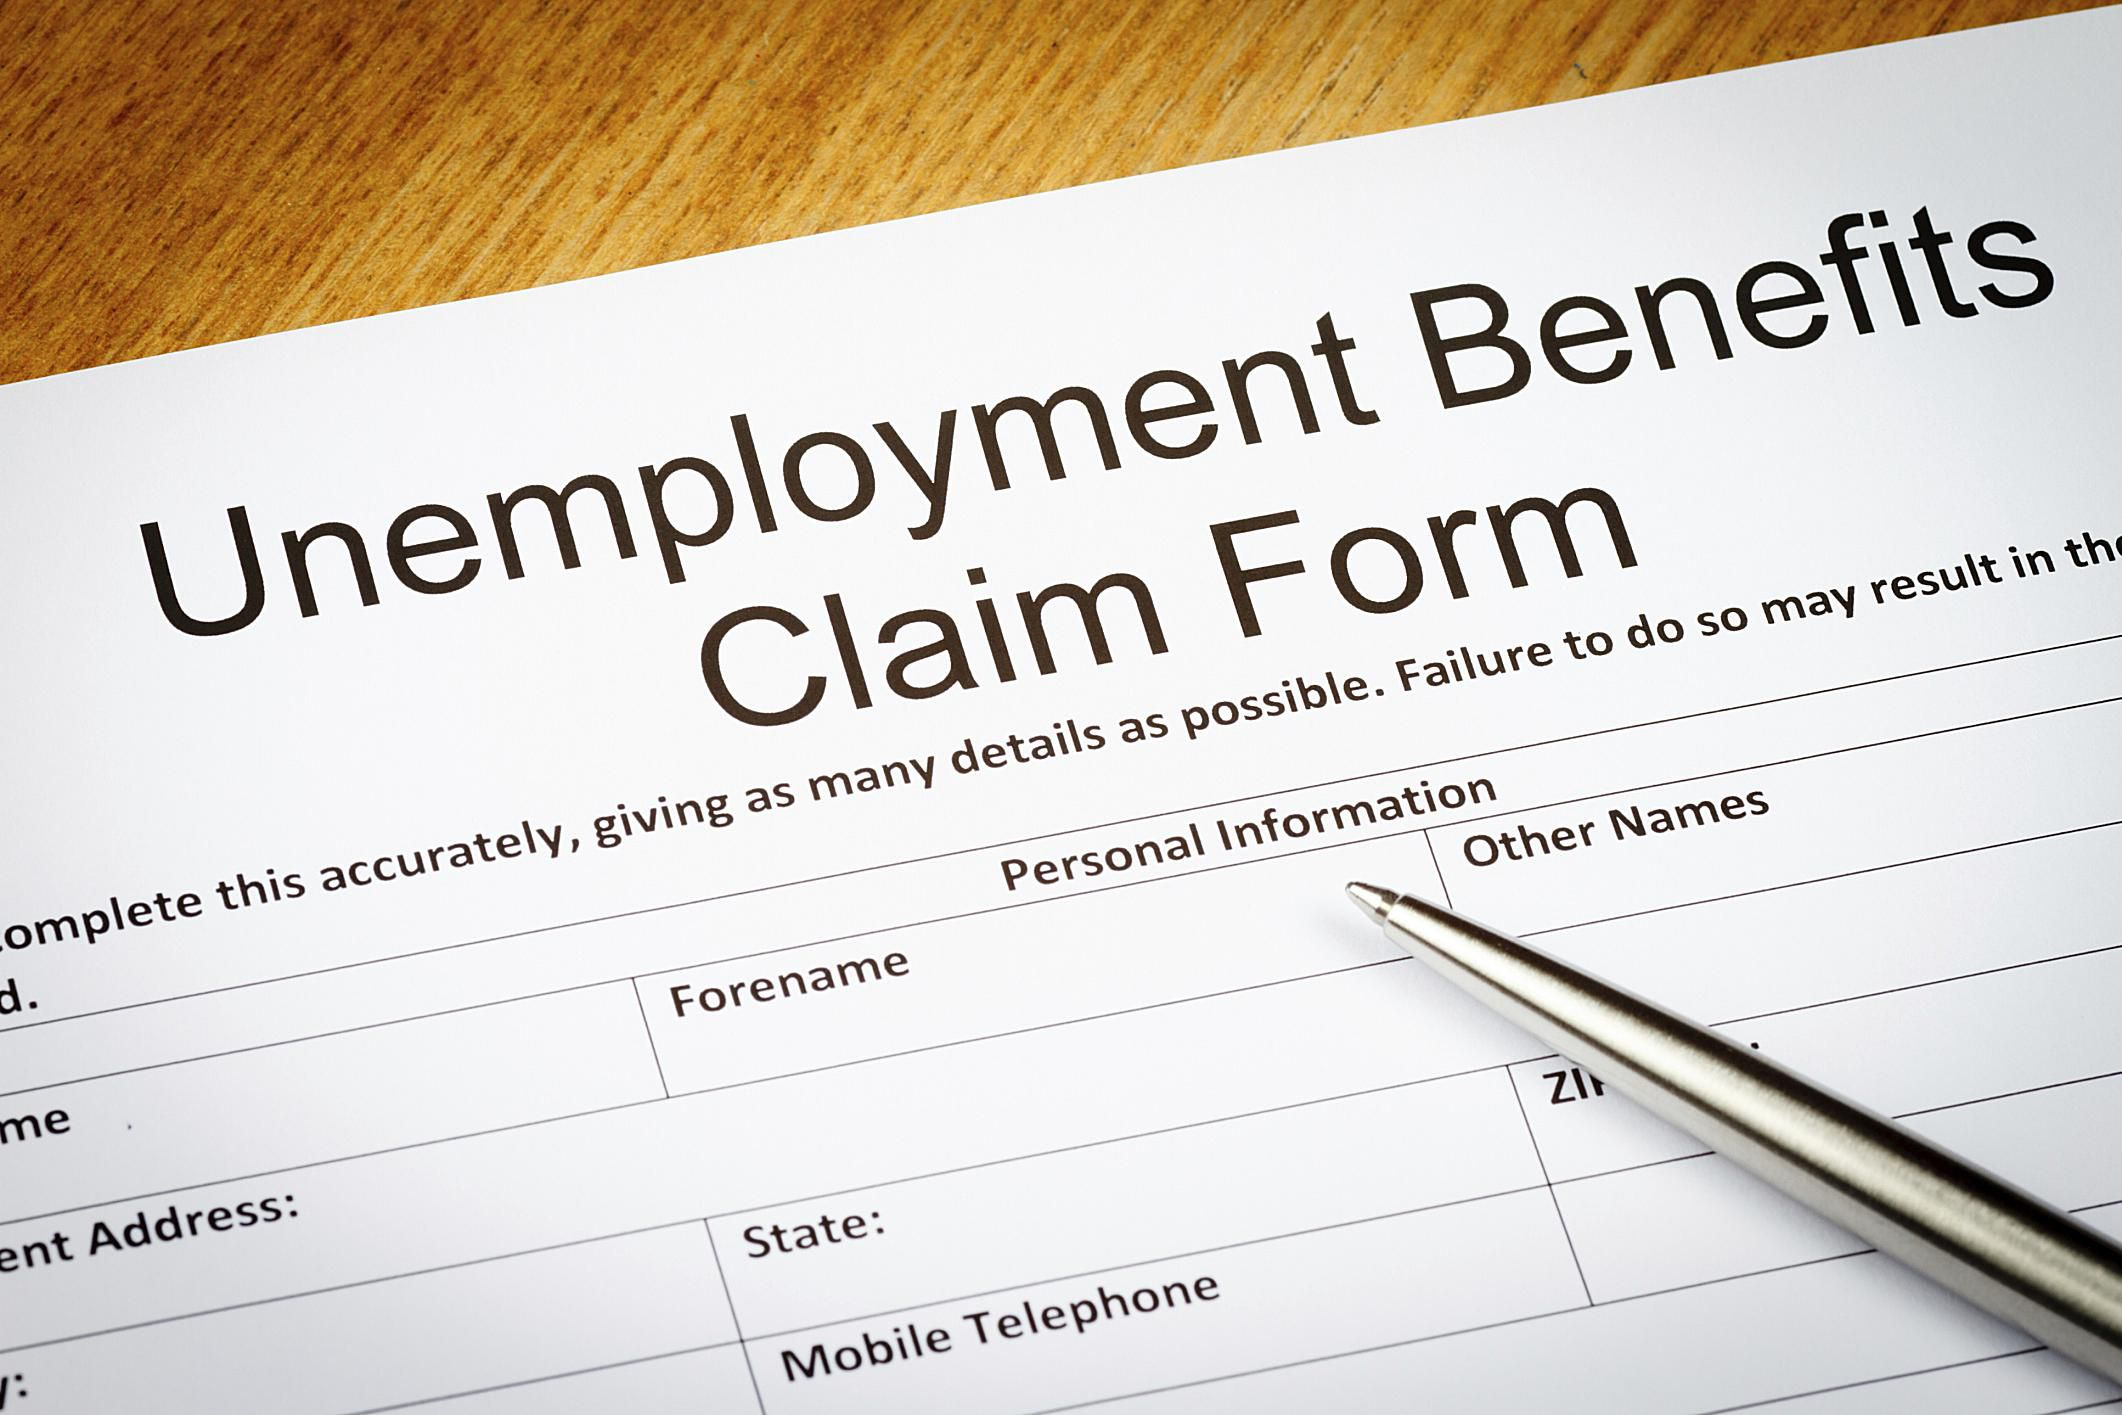 ny unemployment insurance photo - 1